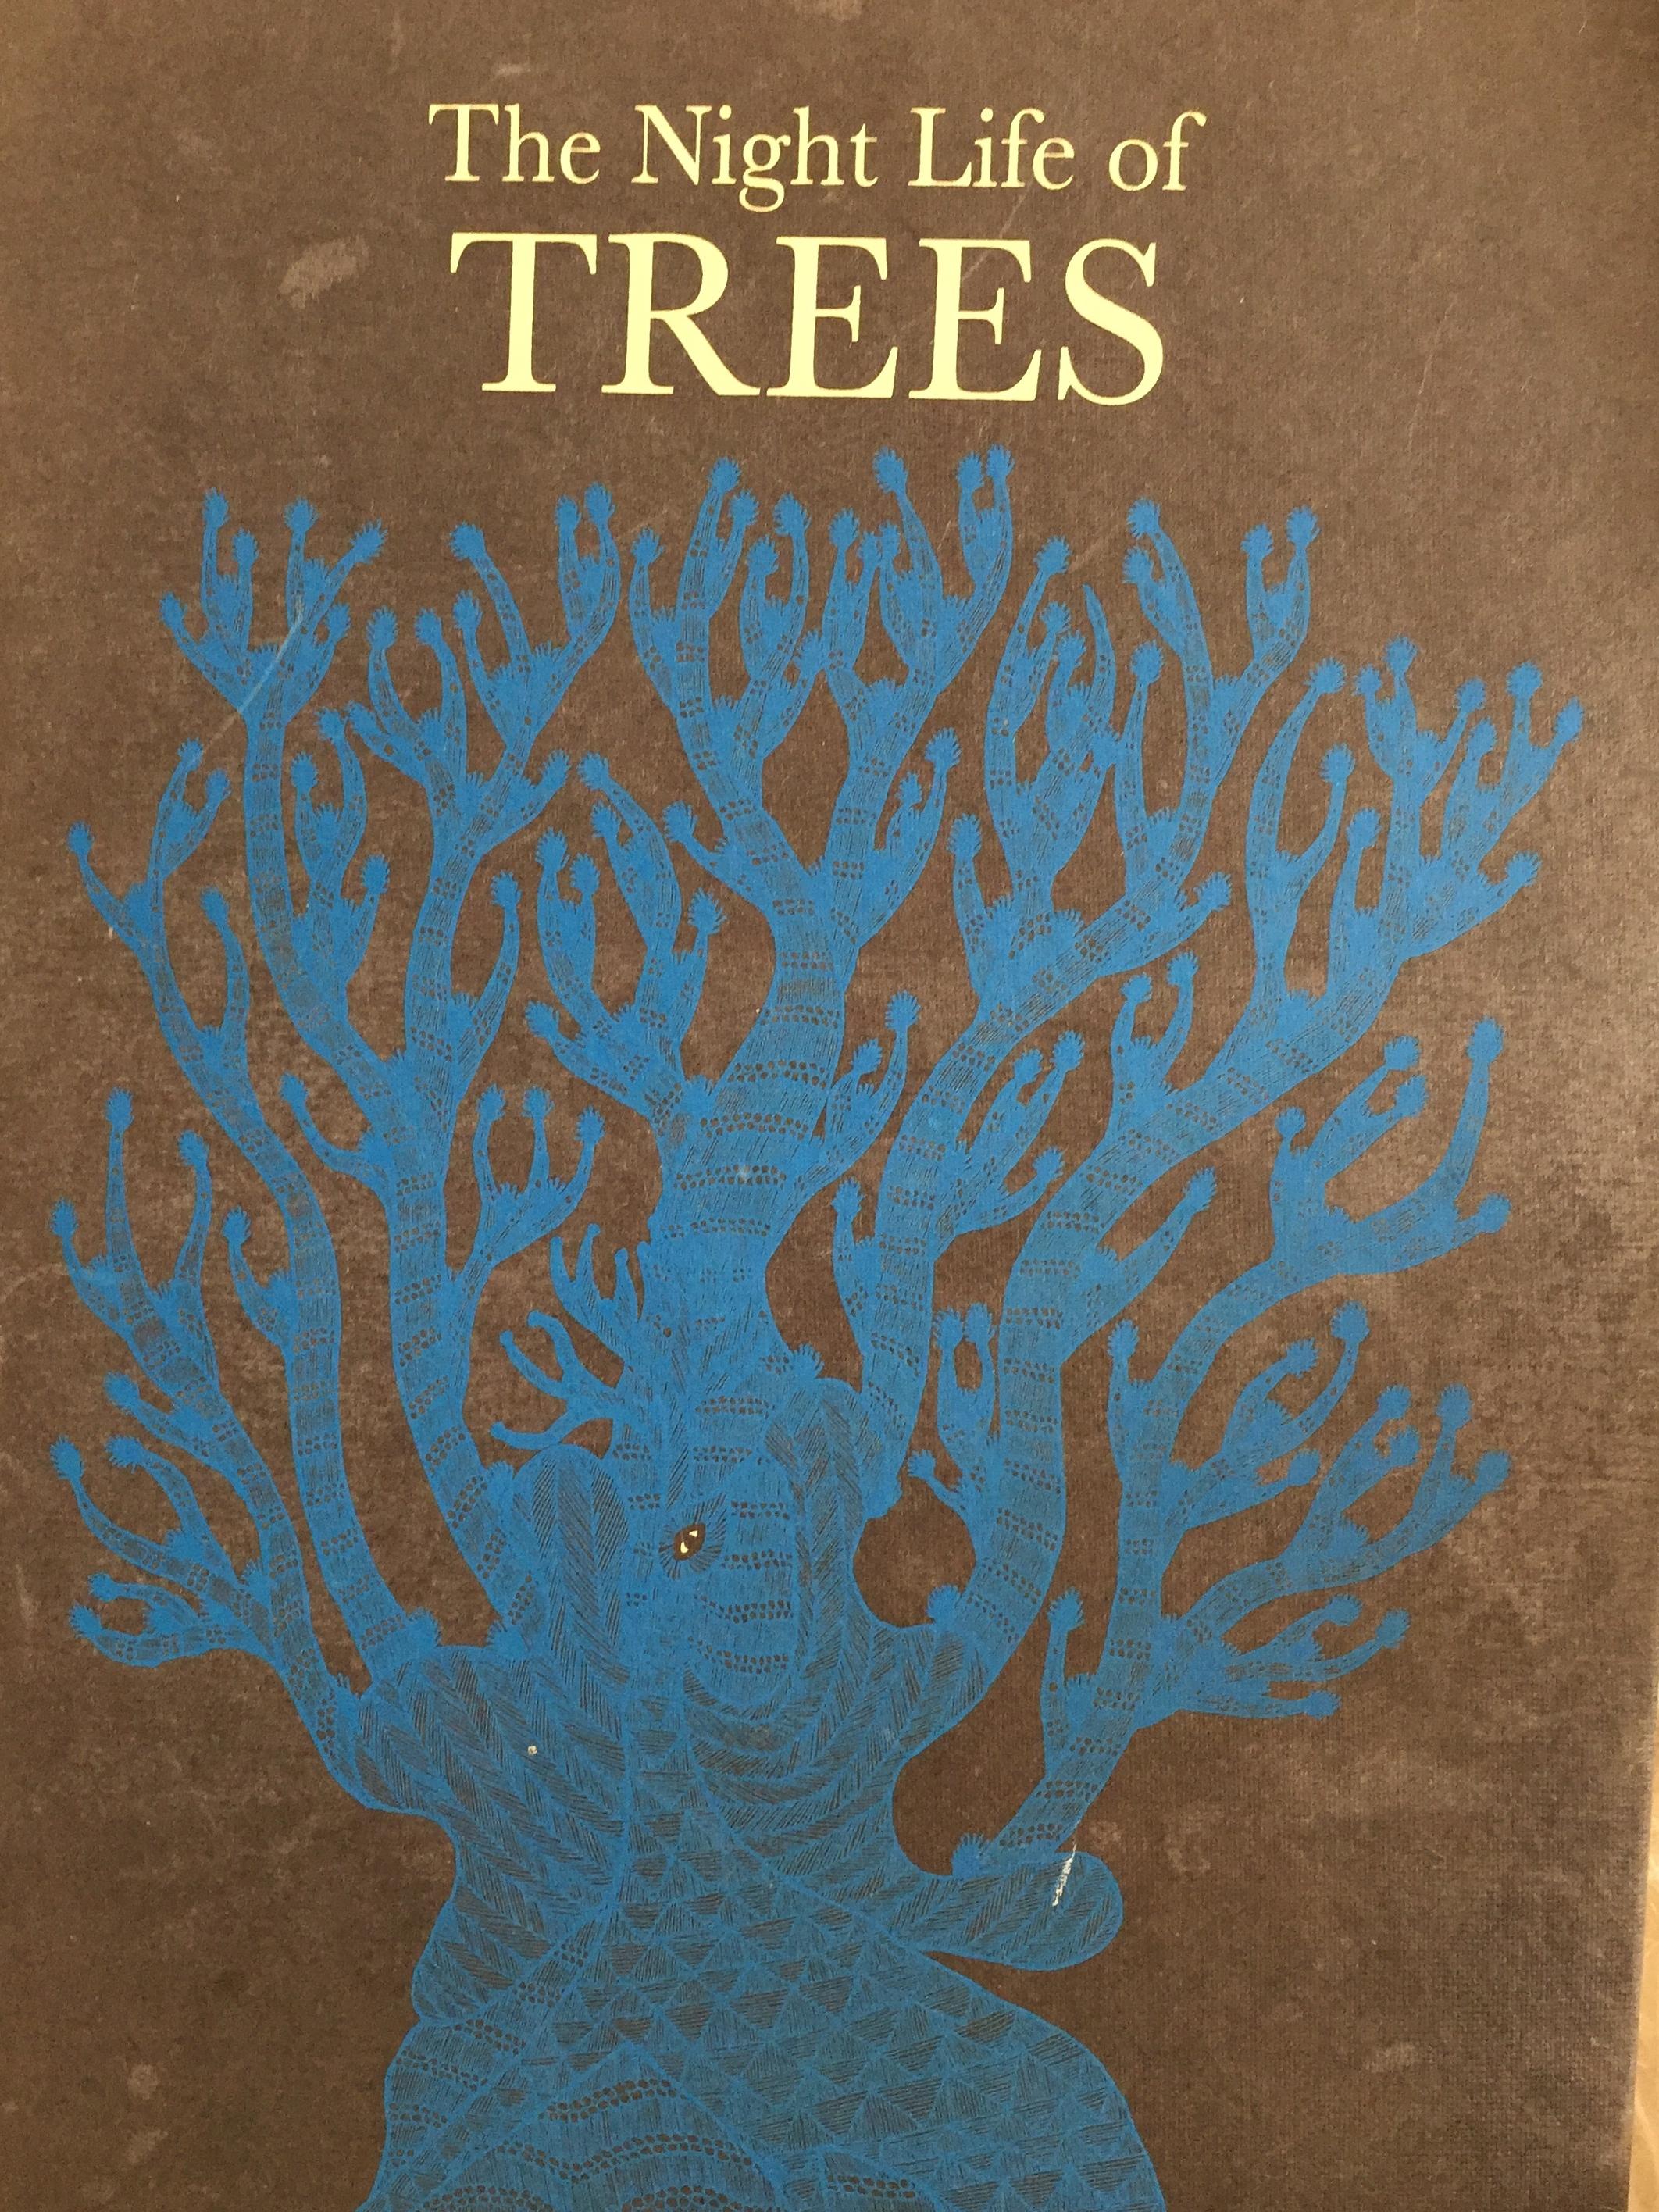 night life of trees.JPG